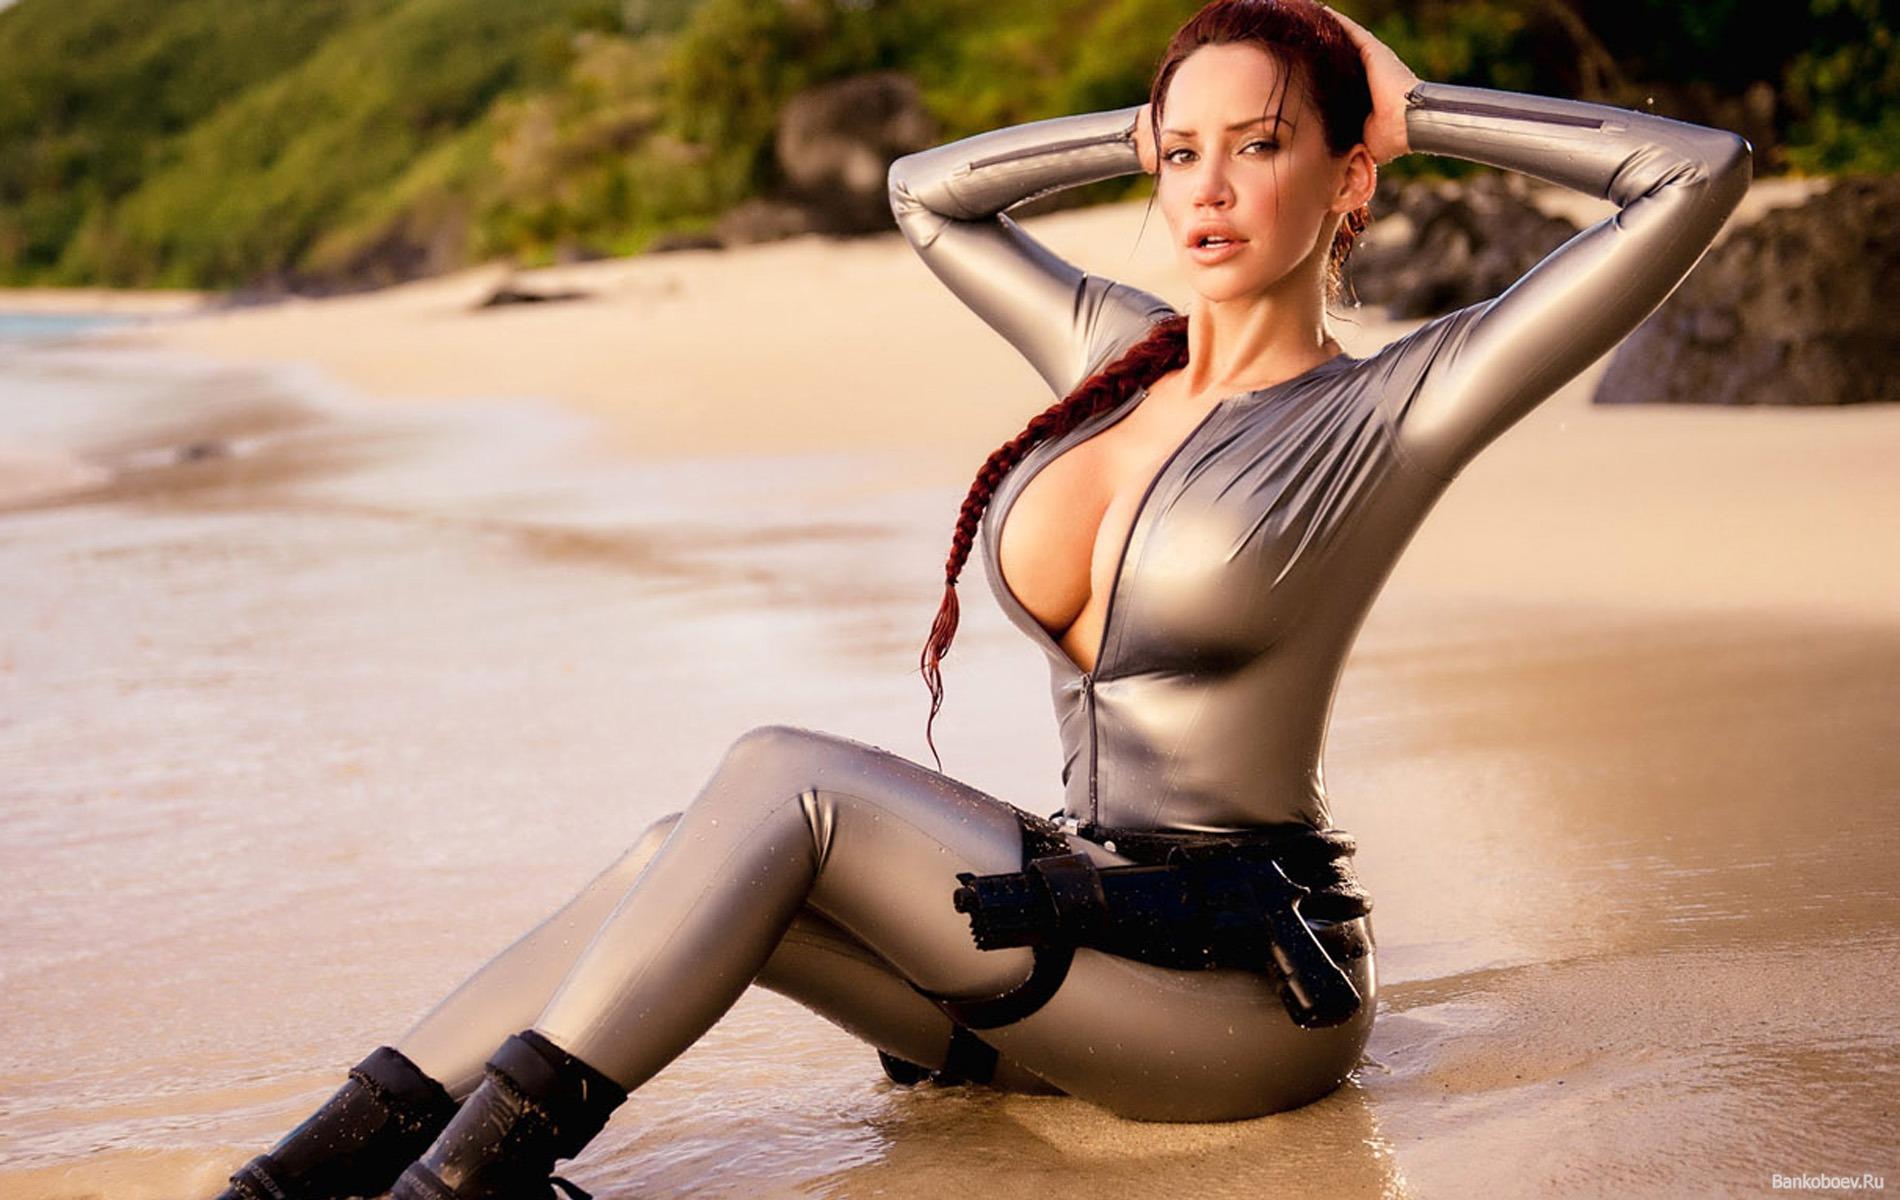 Лаура крофт порно модель фото 790-2